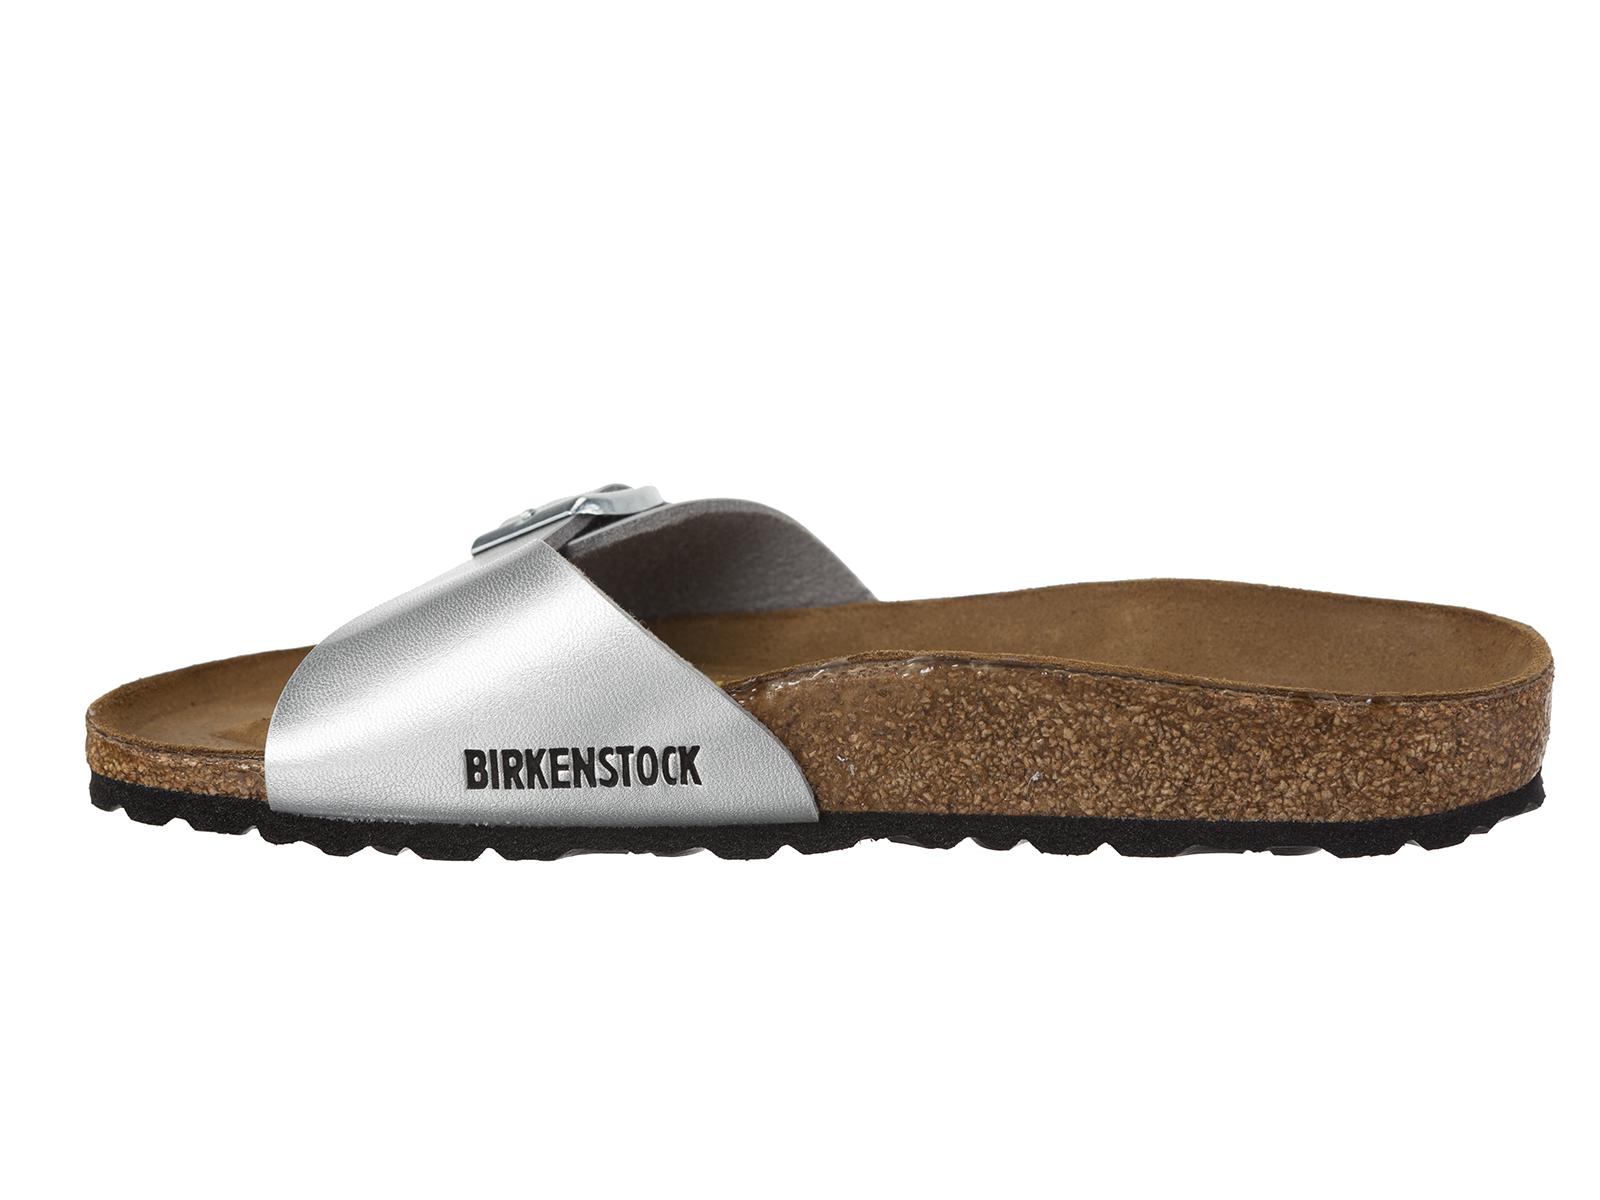 Birkenstock-Donna-Madrid-Ciabatte-Sandali-Scarpe-Estate-Da-Infilare-Fibbia